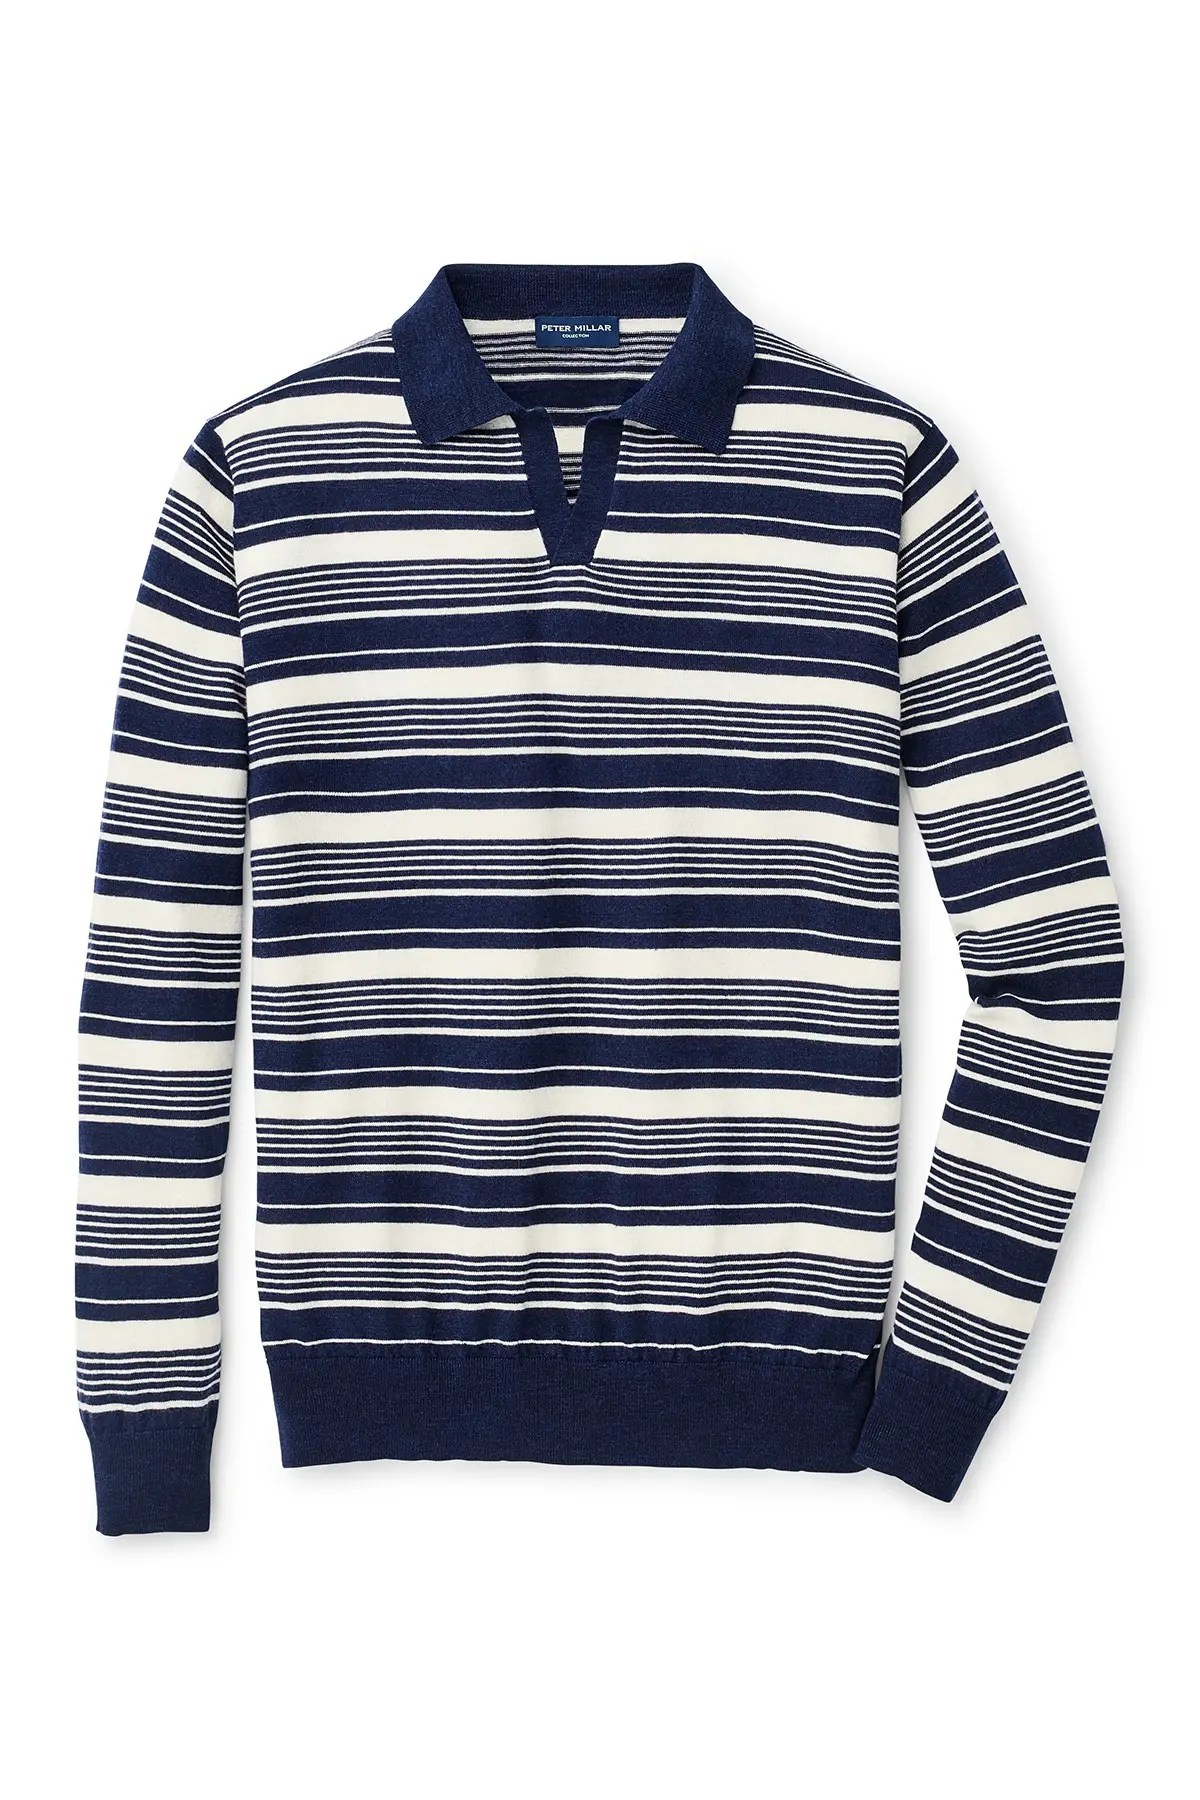 peter millar spring sails riviera collar wool blend sweater nordstrom rack